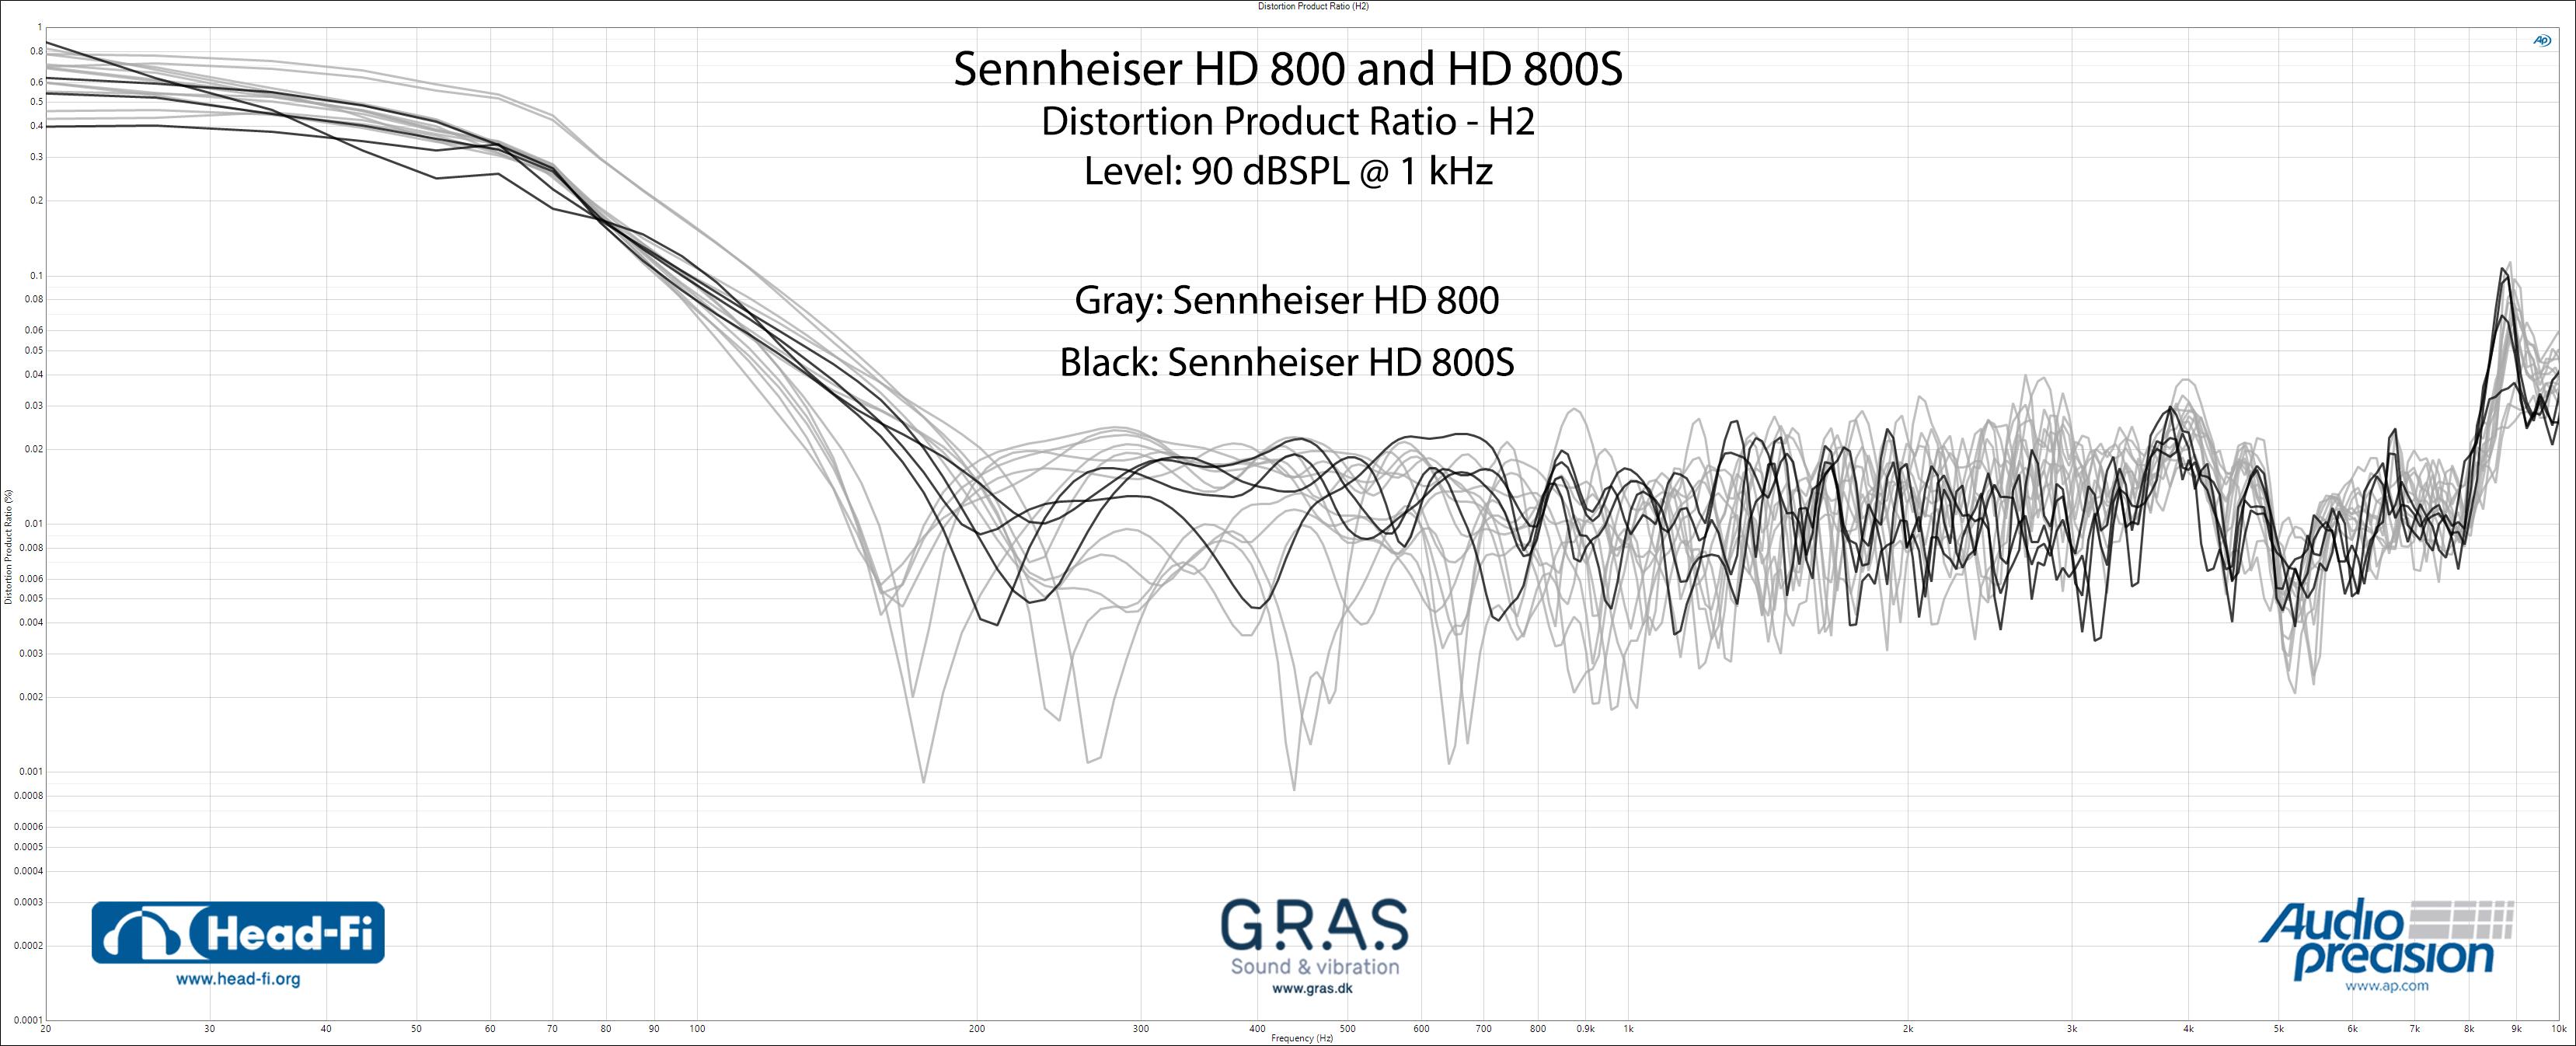 Distortion-Product-Ratio-(H2)_Sennheiser-HD800_Sennheiser-HD800S.jpg